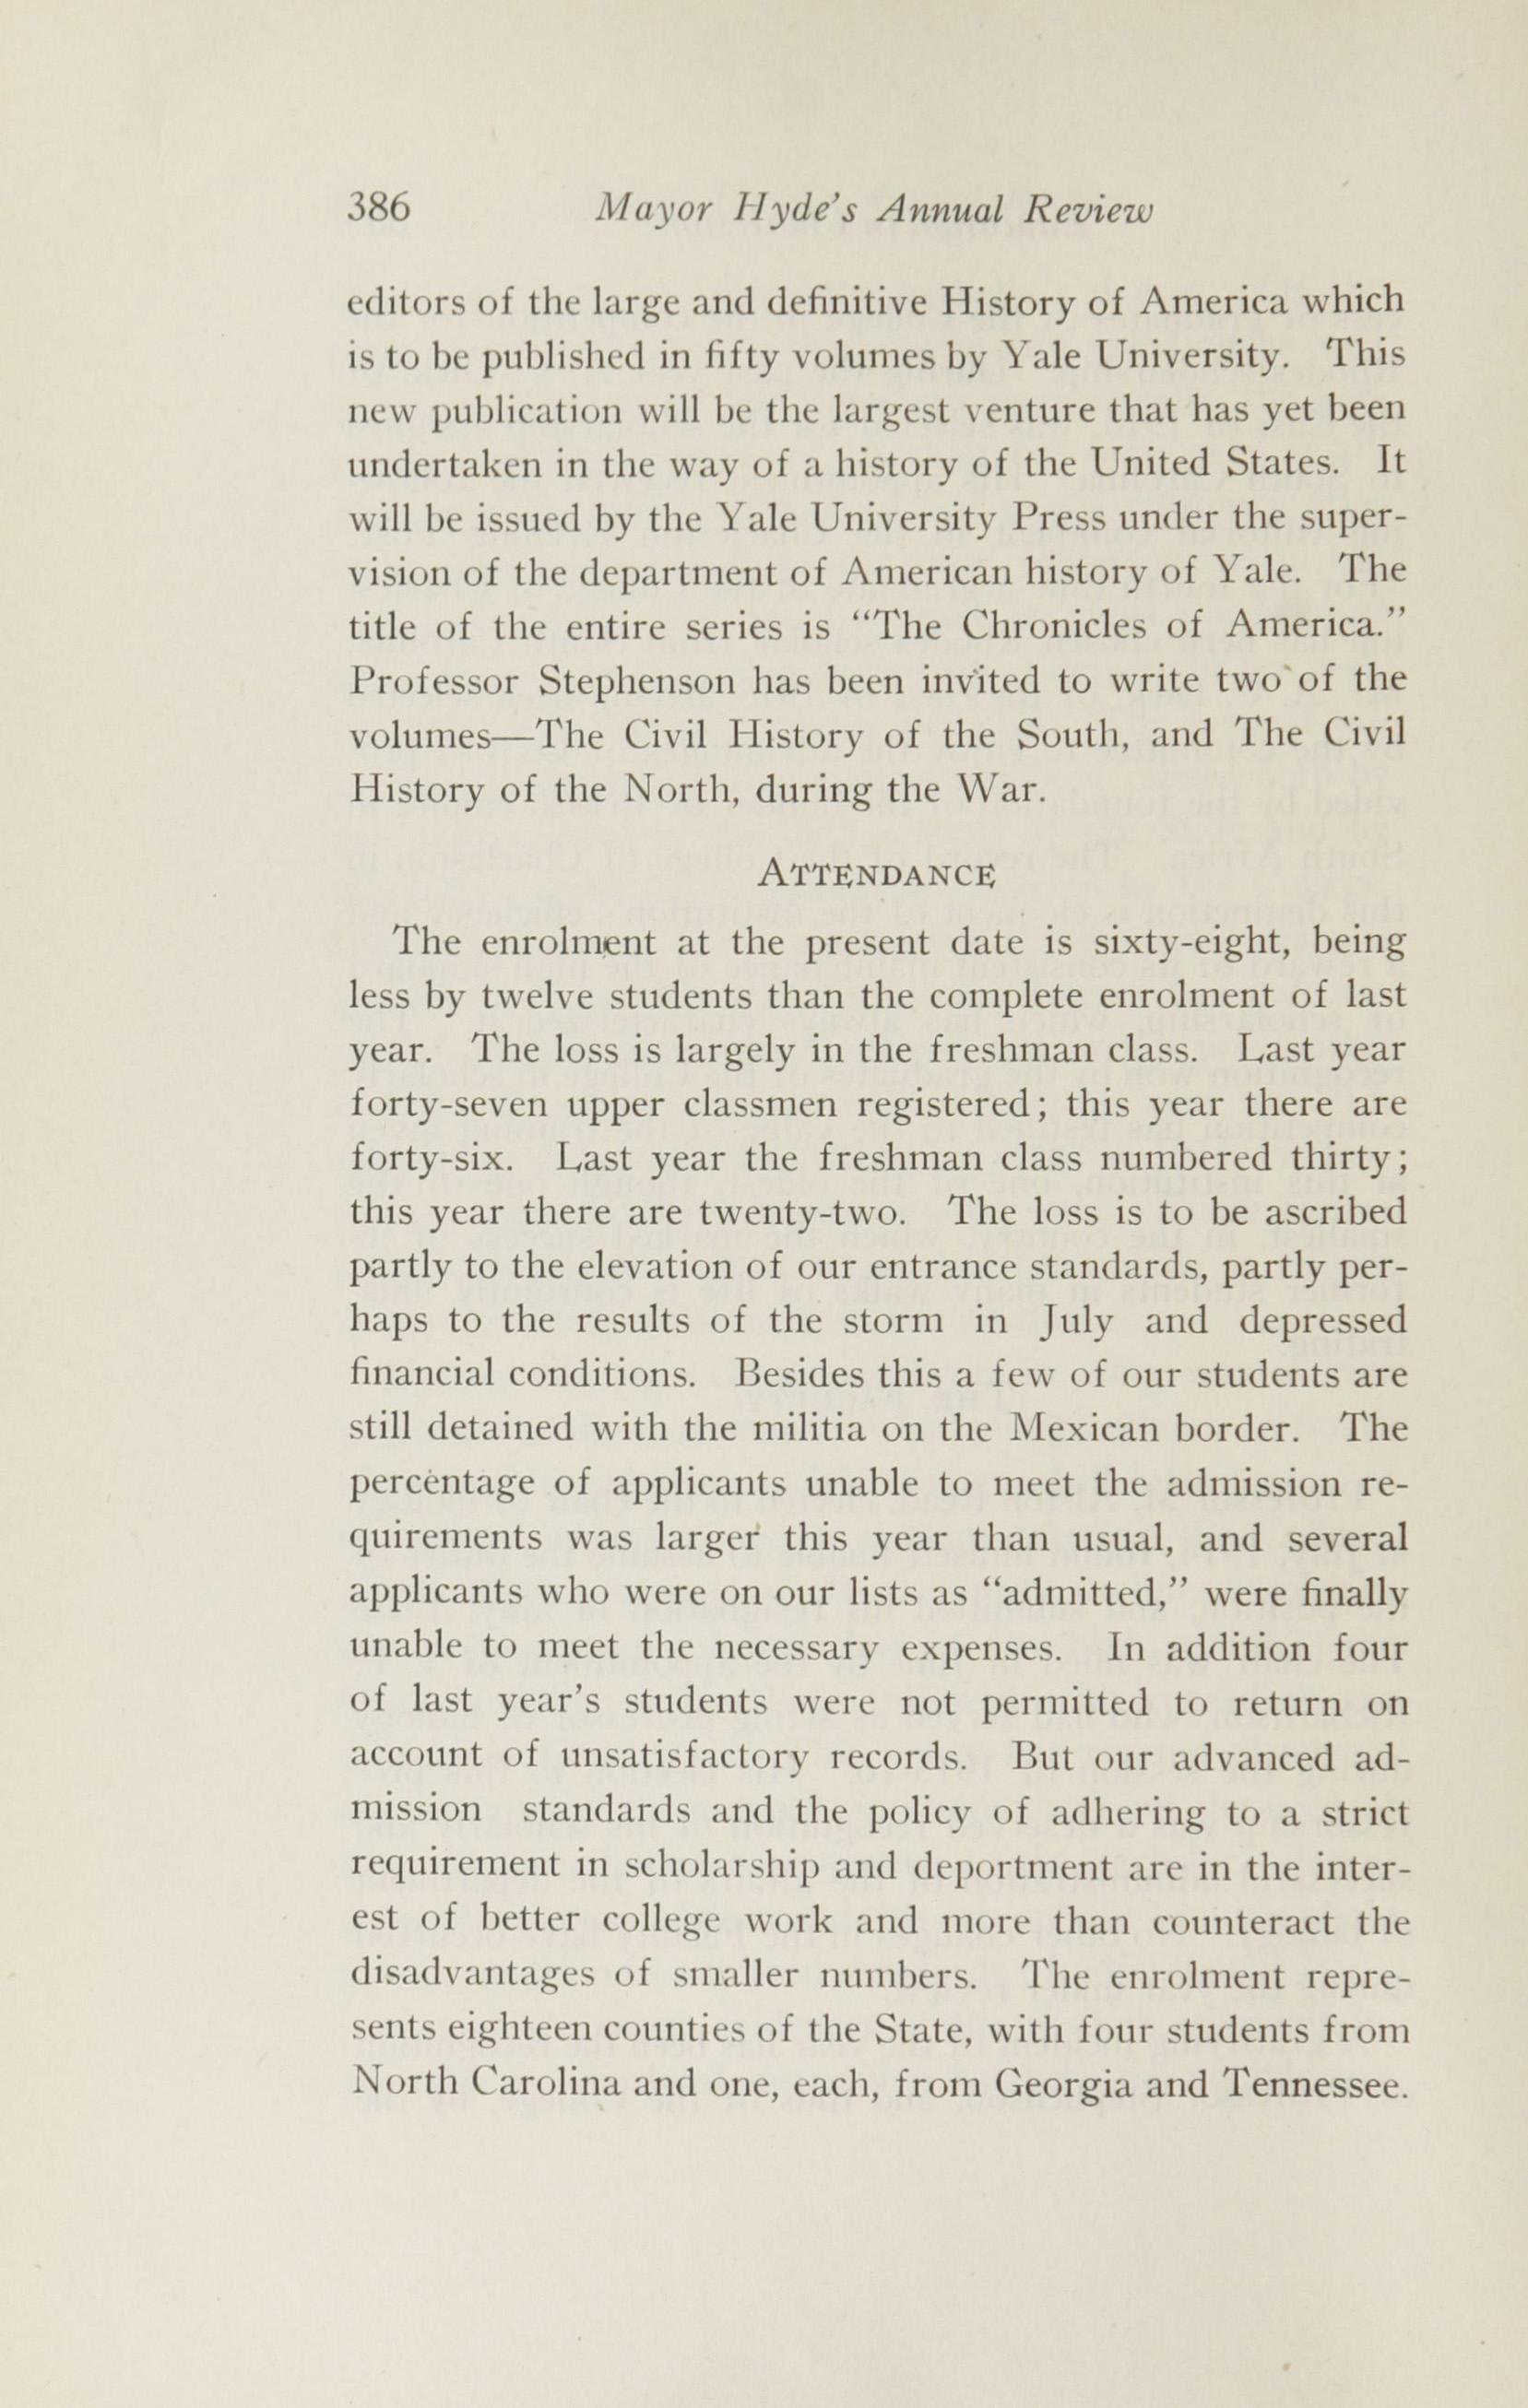 Charleston Yearbook, 1916, page 386